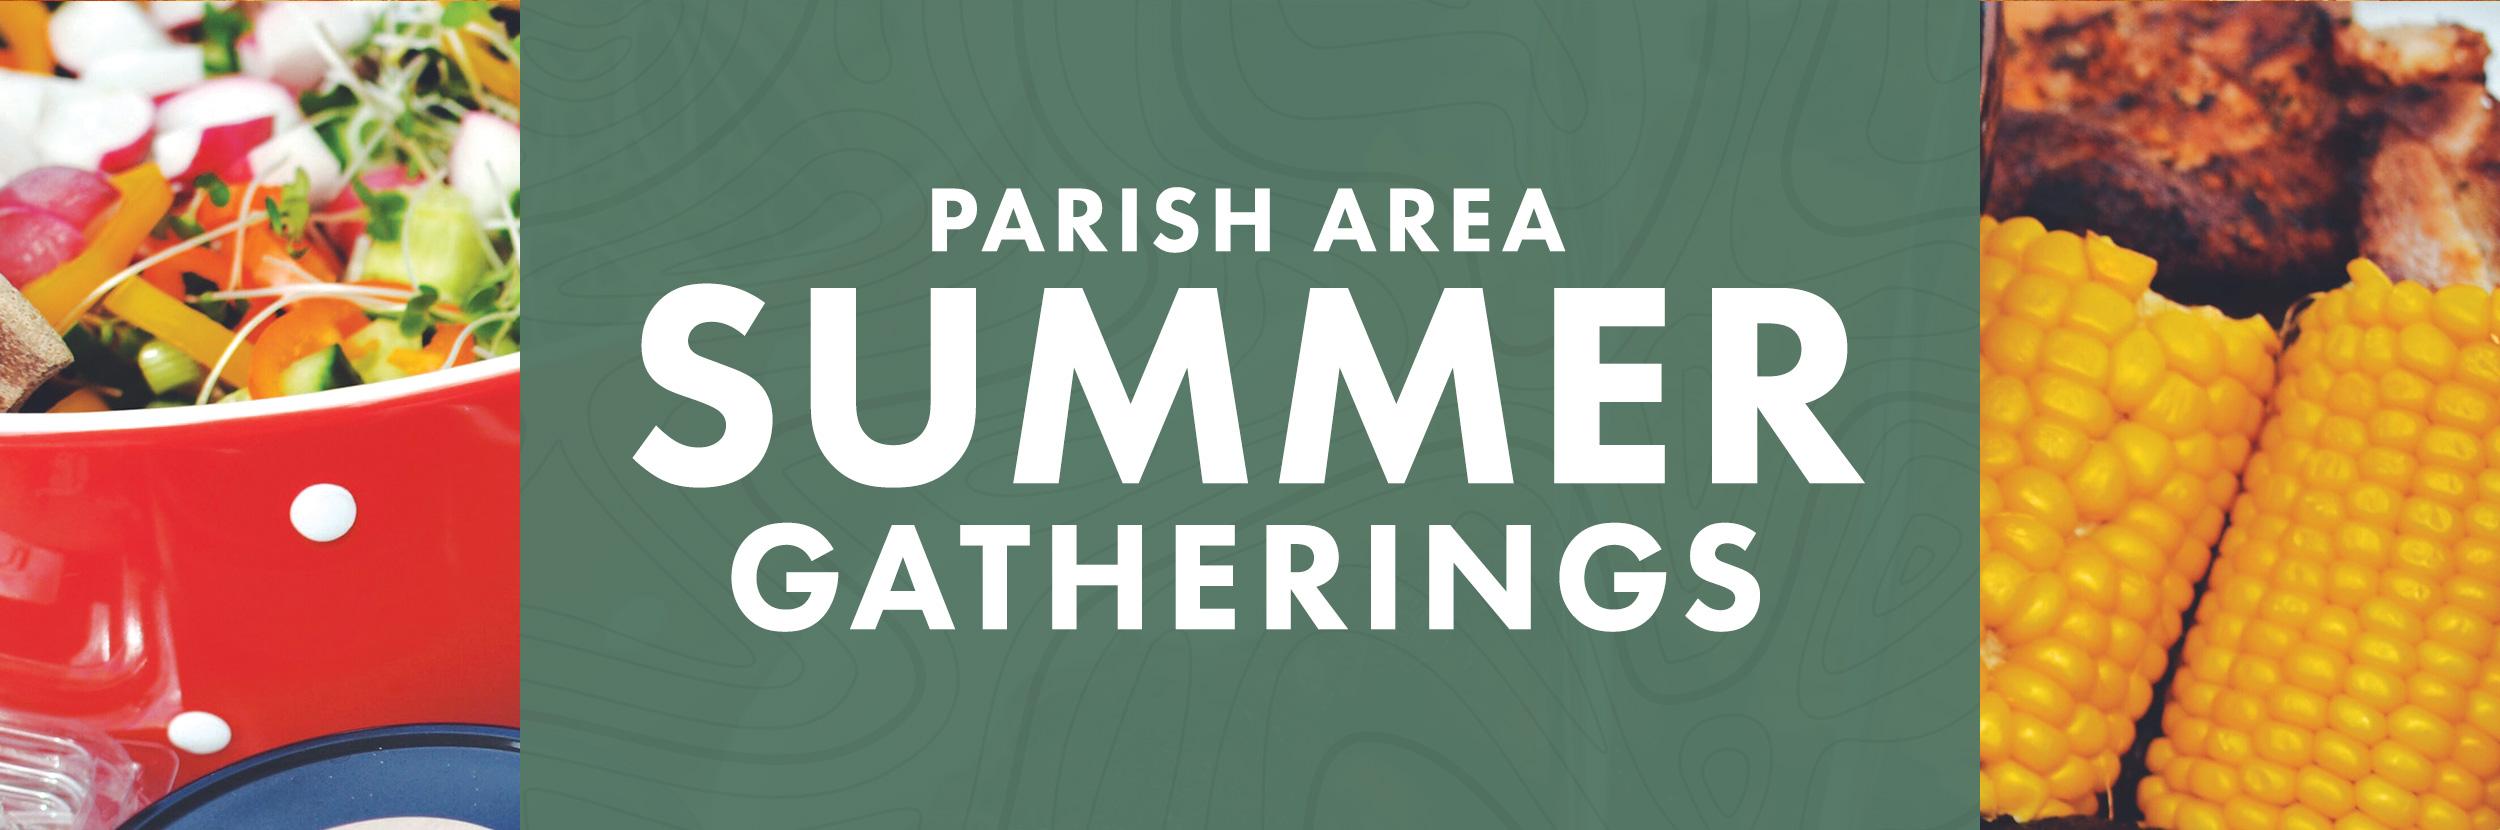 2019-parish-summer-gathering-banner.jpg